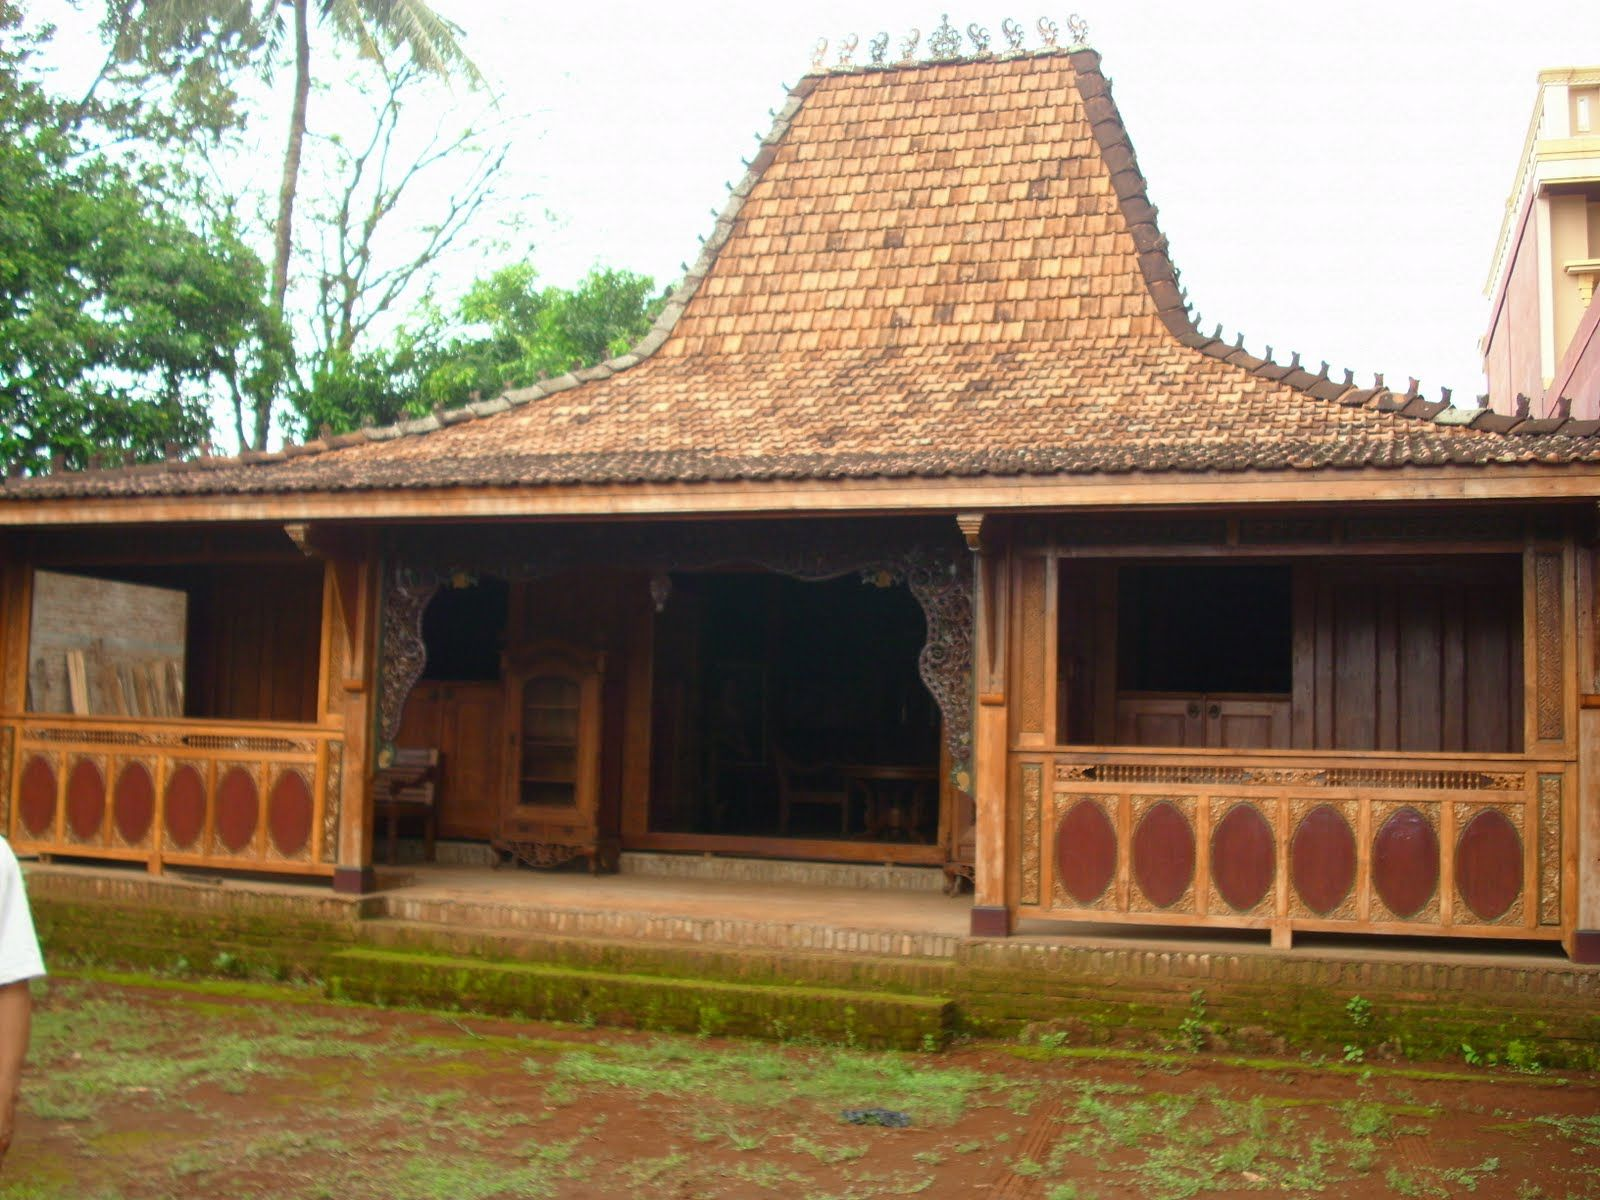 Rumah Limasan Dijual Yogyakarta Sama Dengan Rumah Limasan Dijual Yogyakarta Subjek Bersama Dengan Rumah Limasan Jogja Dijual Desain Rumah Rumah Kayu Arsitektur